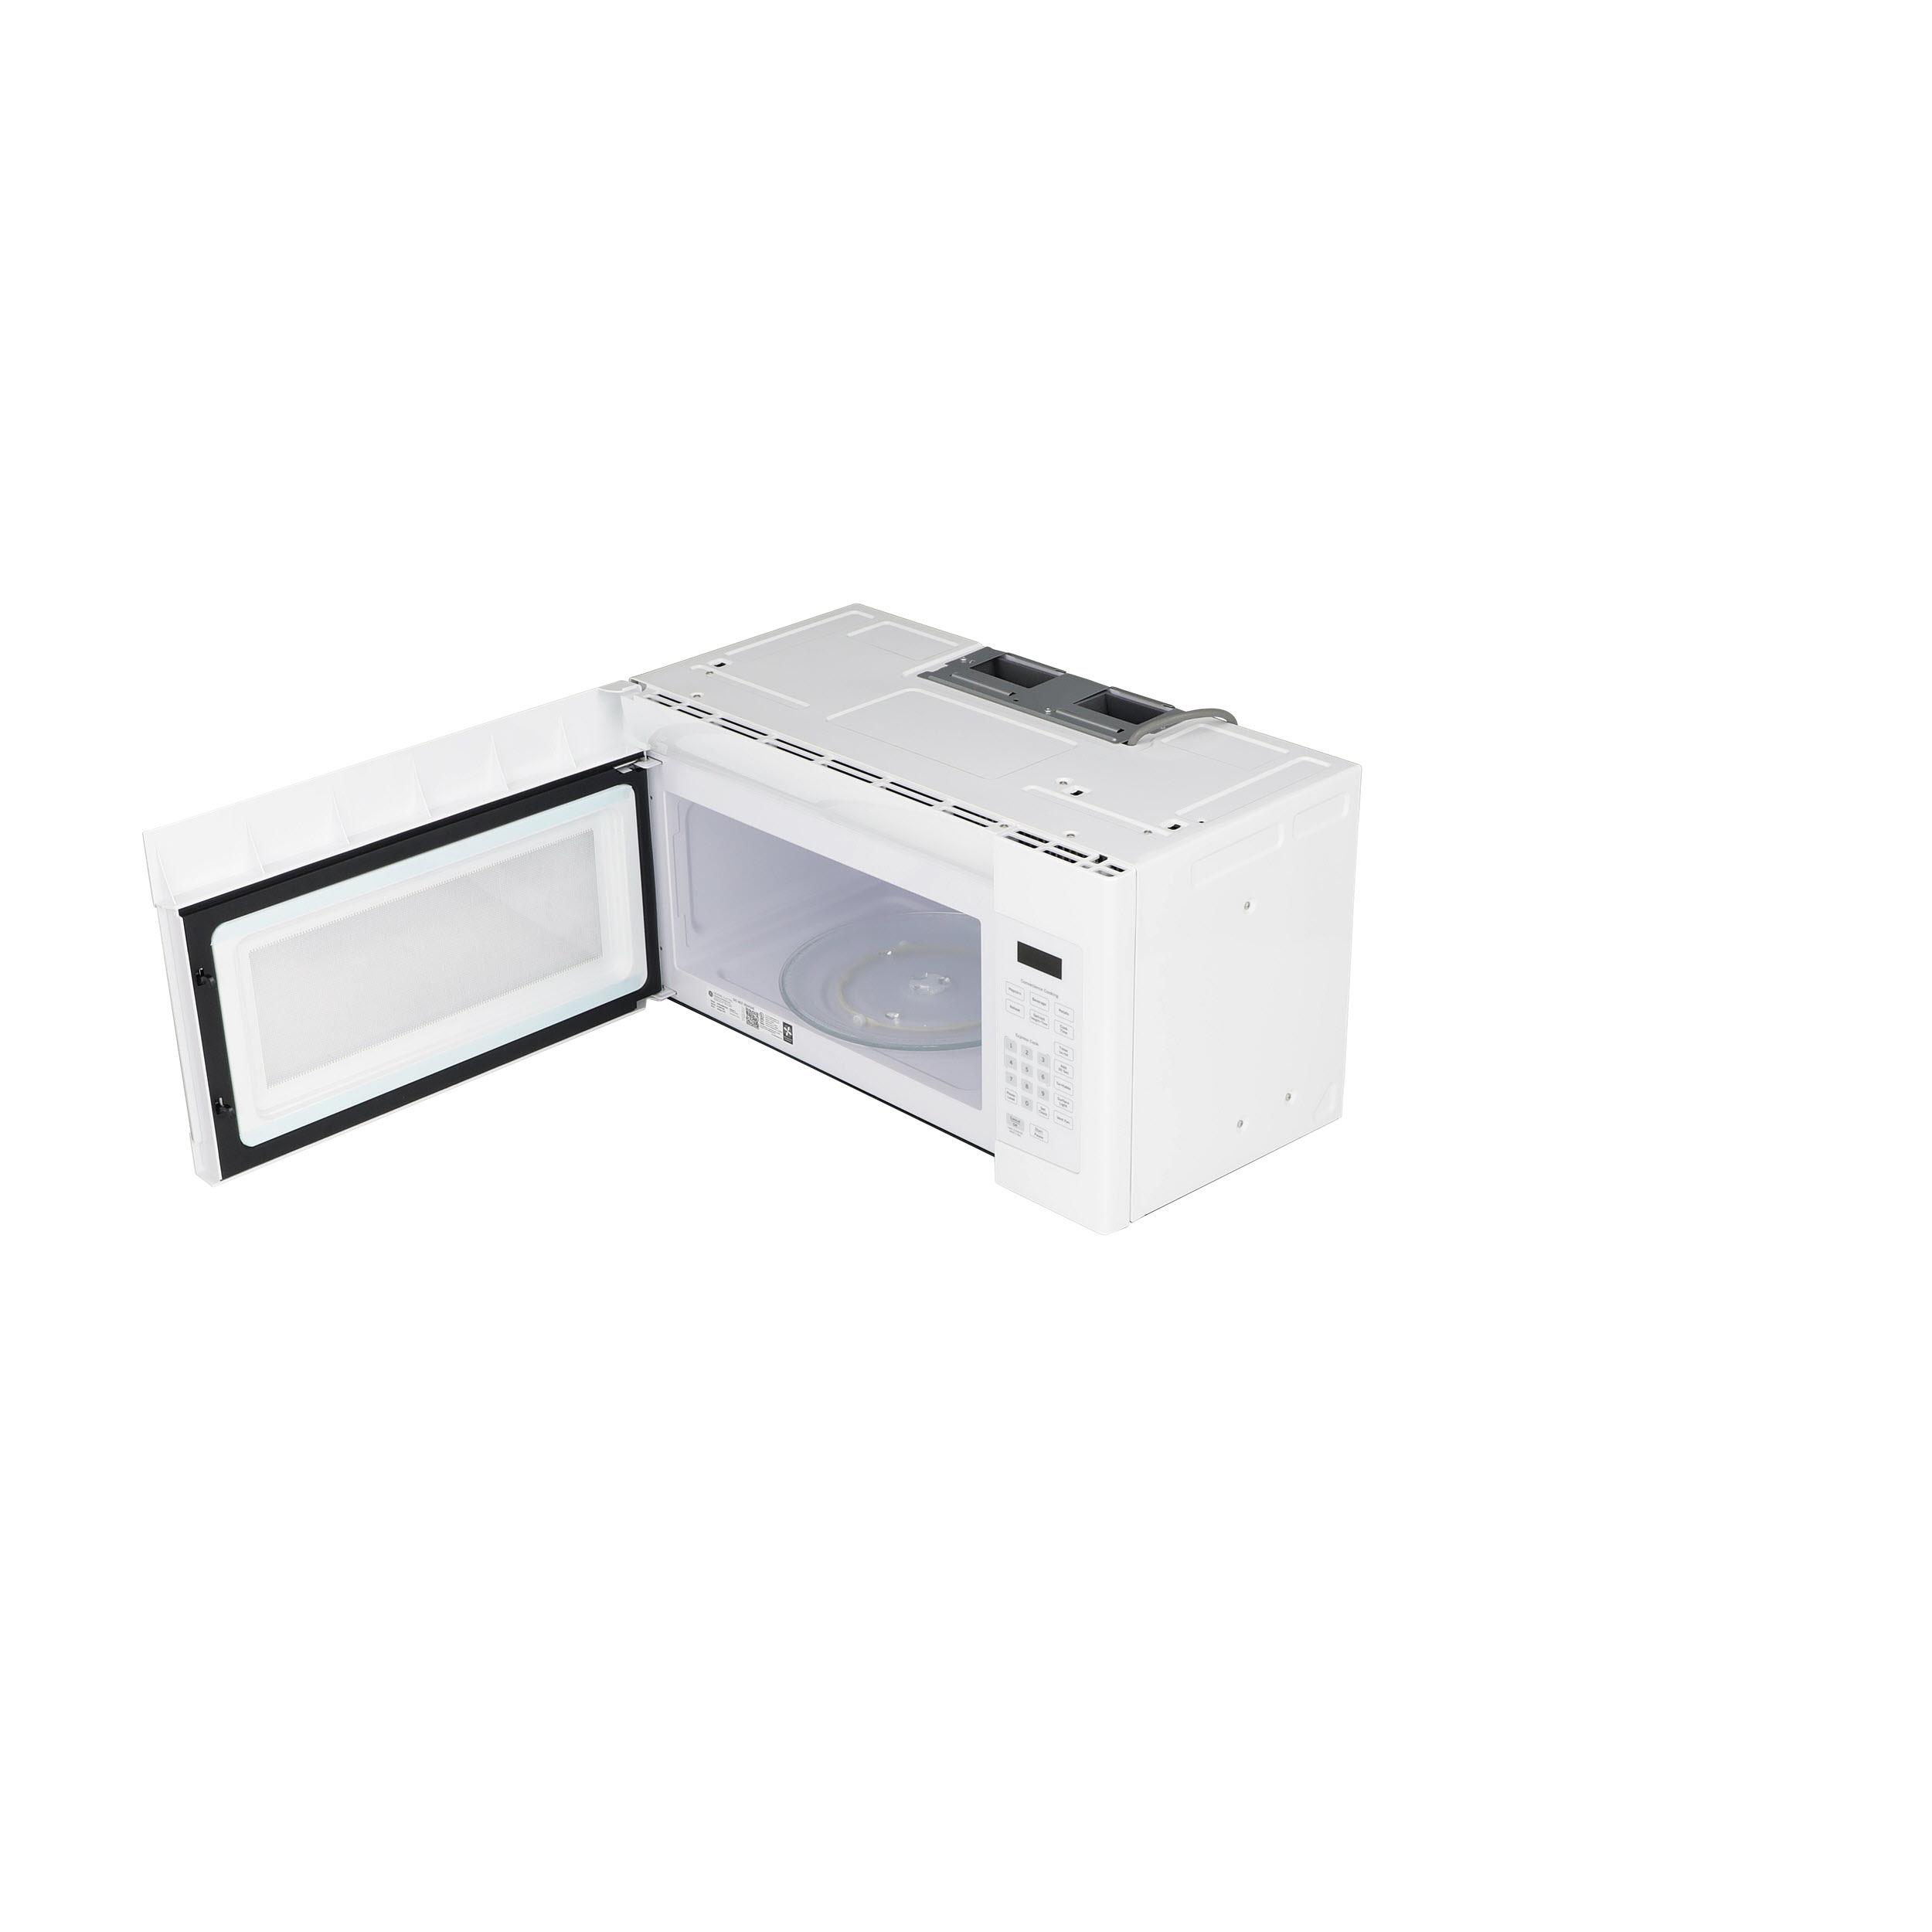 tom b morrissey tv appliances